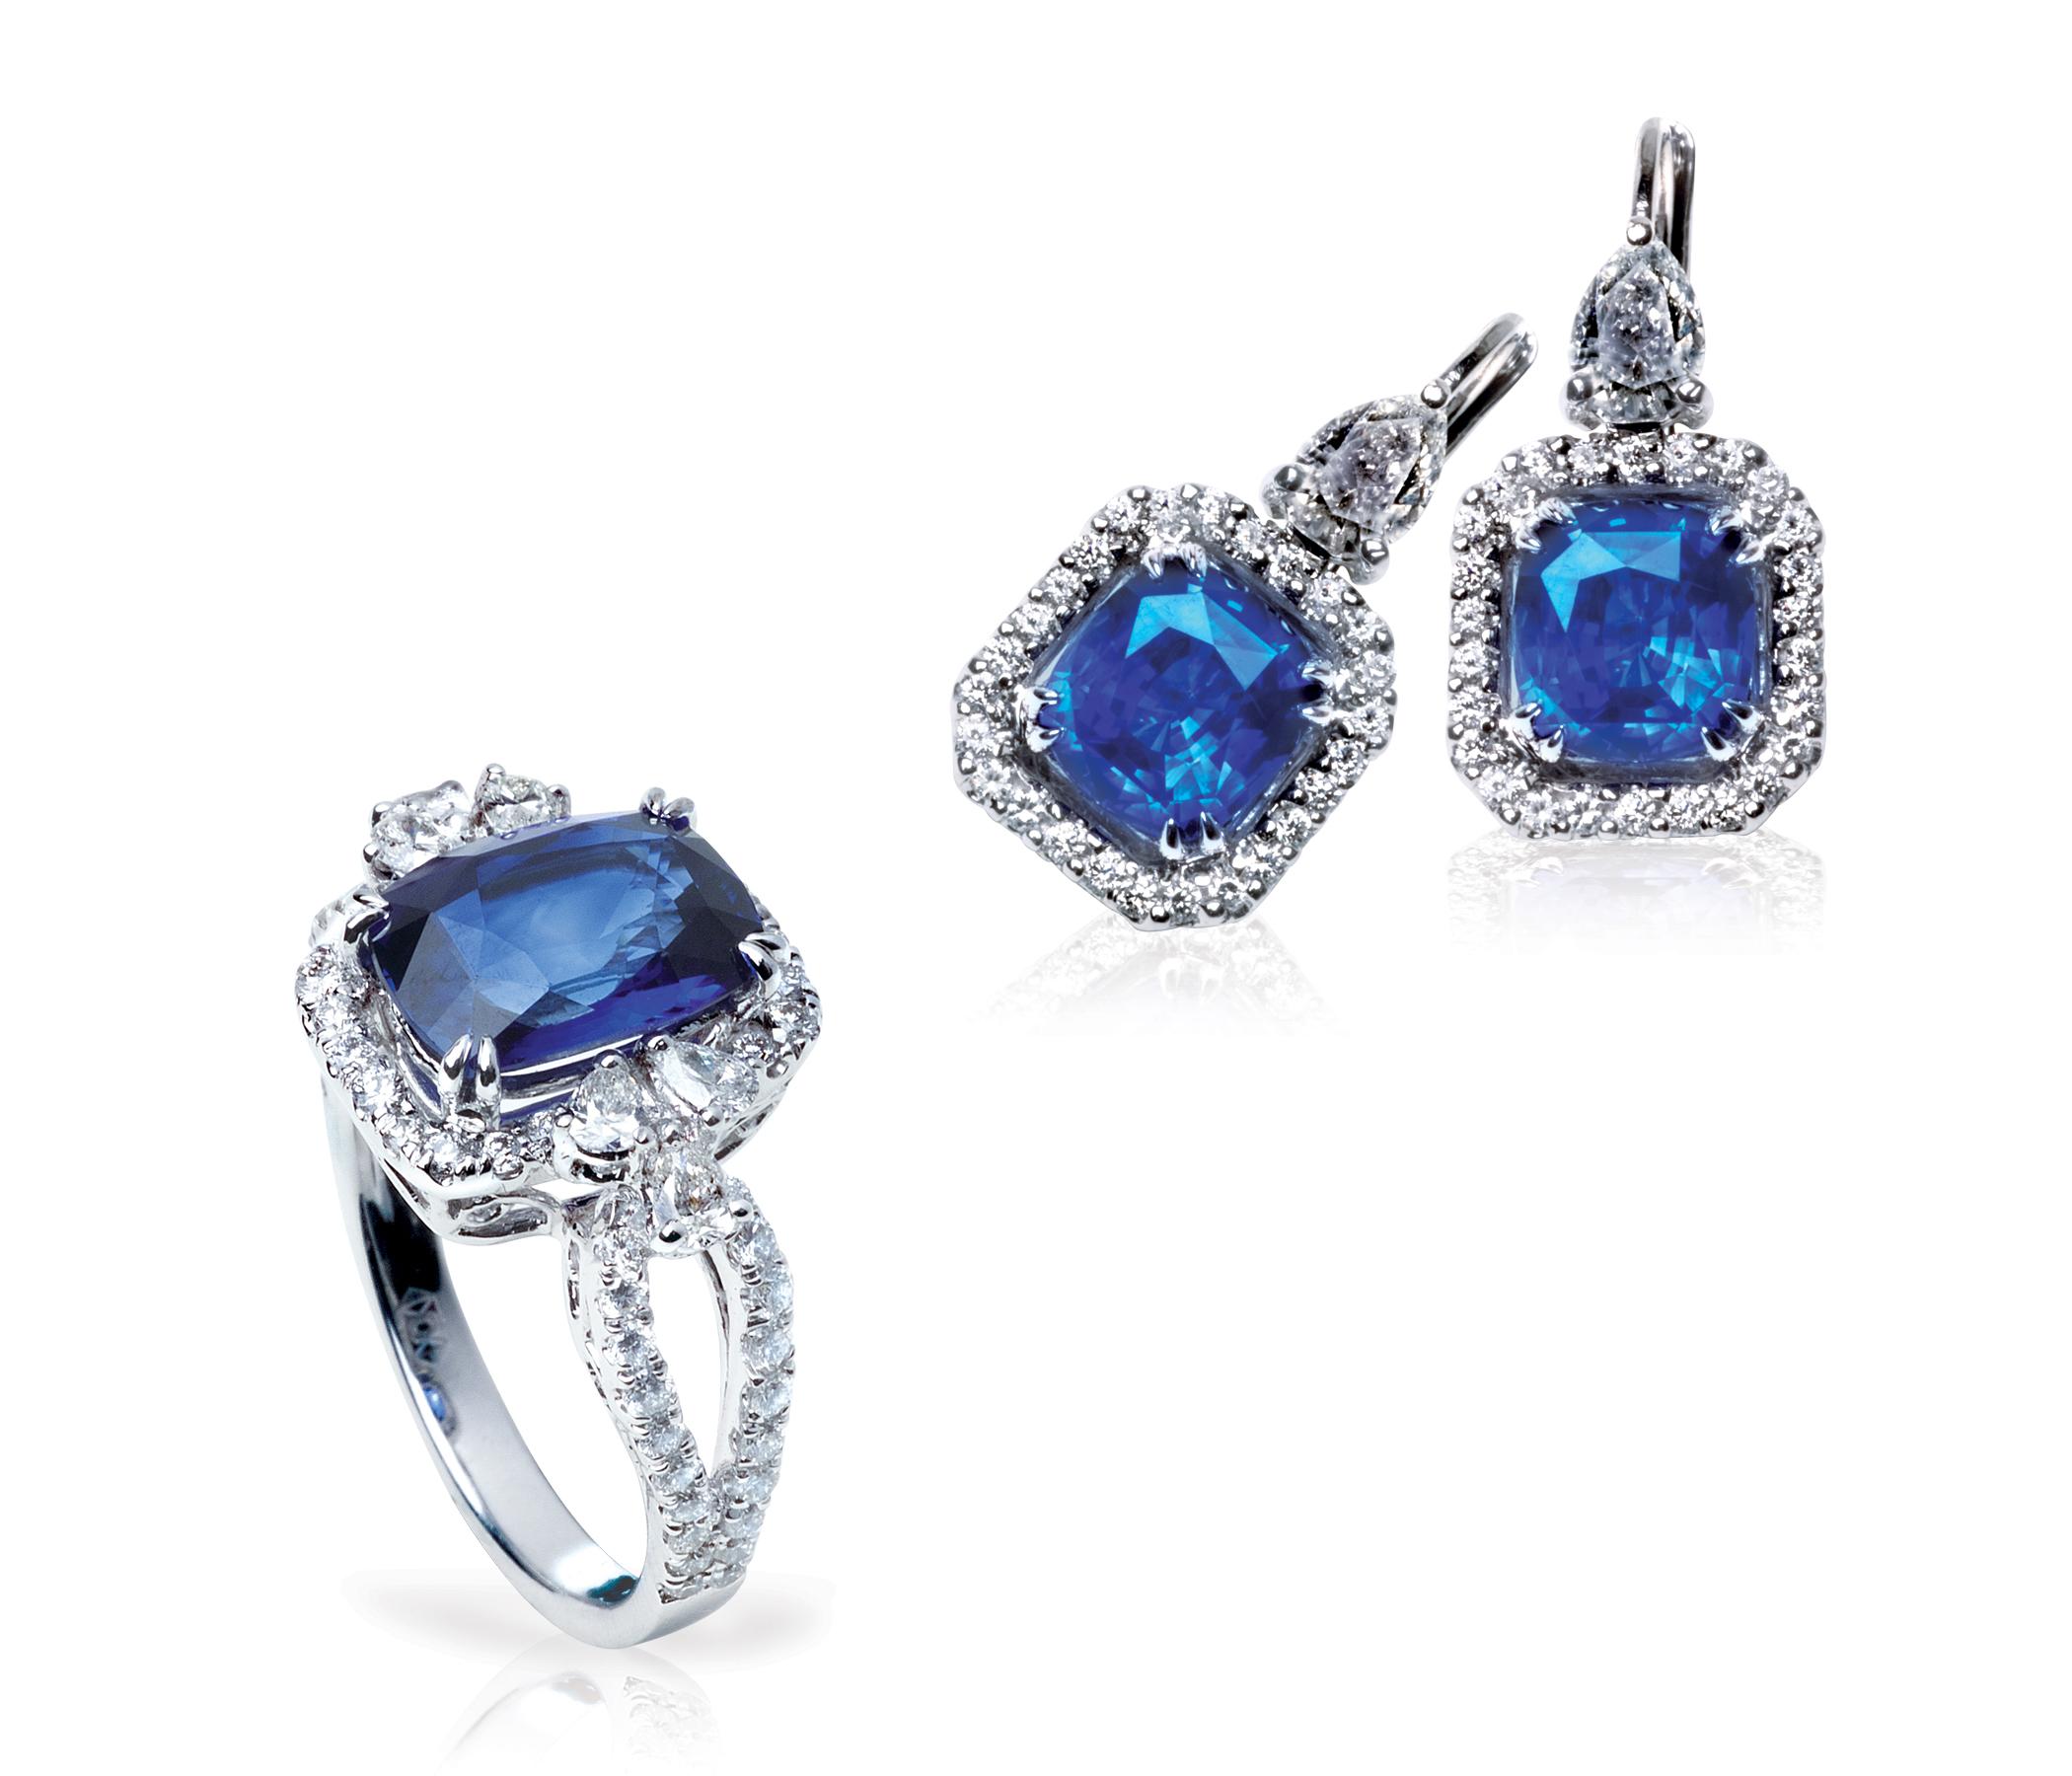 BLUE SAPPHIRE & DIAMOND JEWELLERY SET BESPOKE FINE JEWELLERY BY SHAHINA HATTA